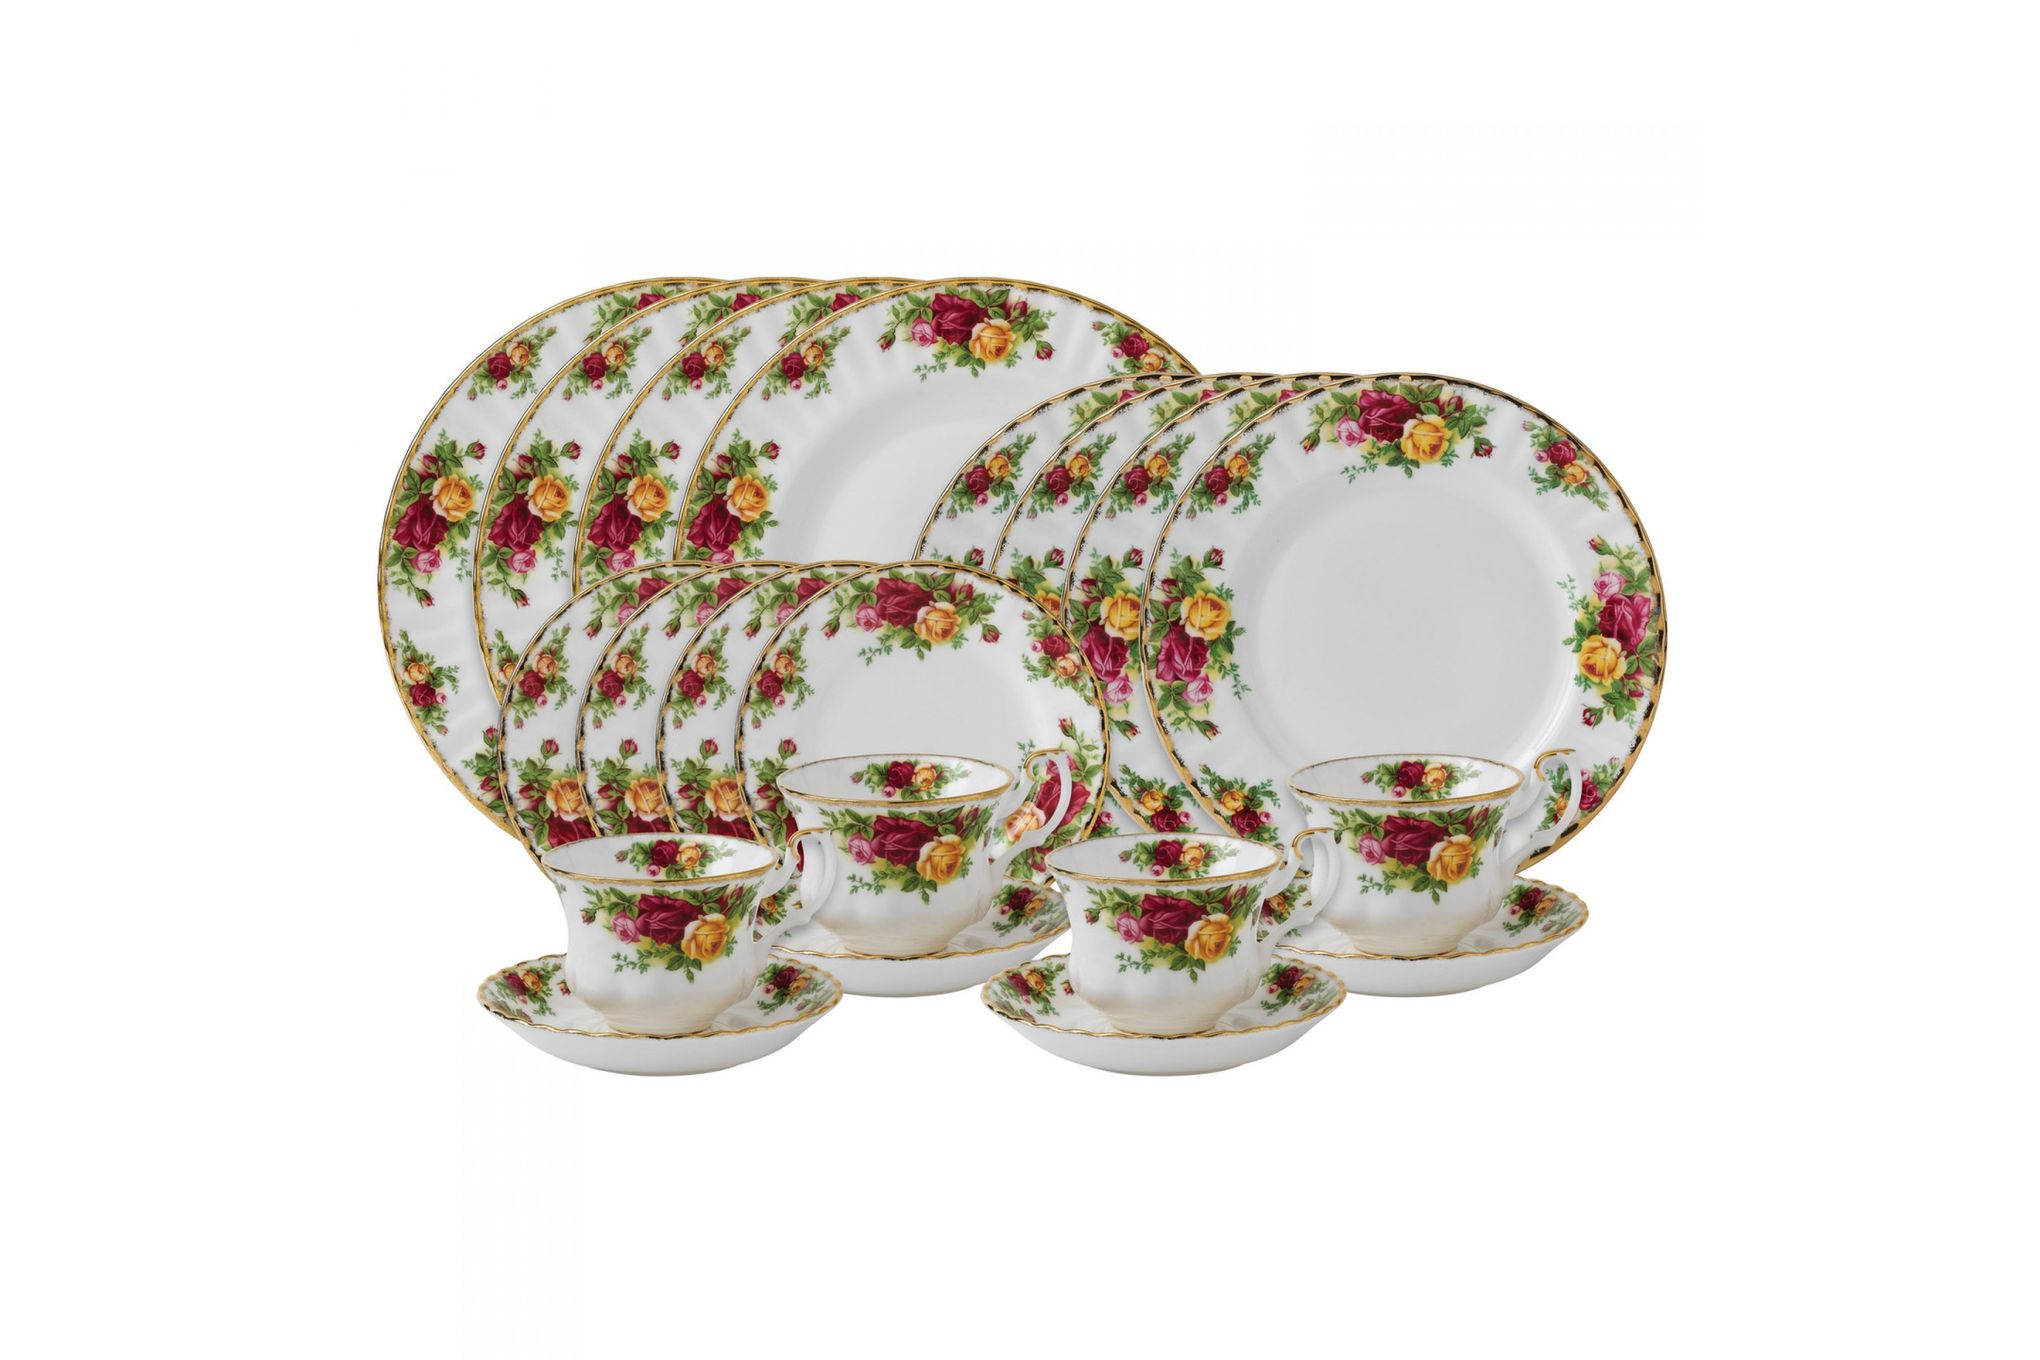 Royal Albert Old Country Roses - Made Abroad 20 Piece Set 4x Plate 27cm, 4x Plate 20cm, 4x Plate 16cm & 4x Teacup and Saucer thumb 1